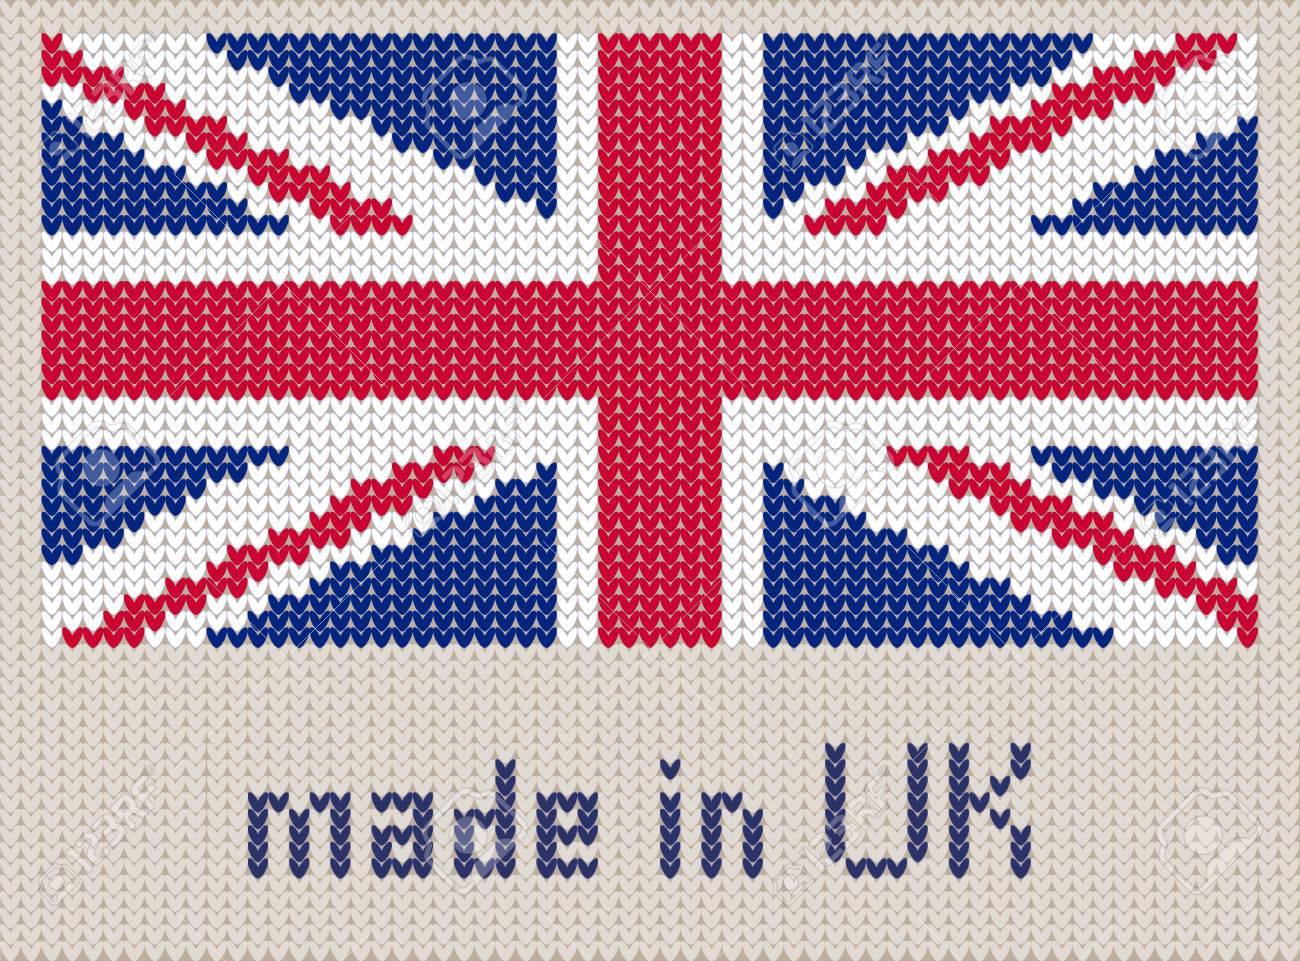 Union Jack Knitted Pattern, UK Flag. Modern Vector Ornament ...